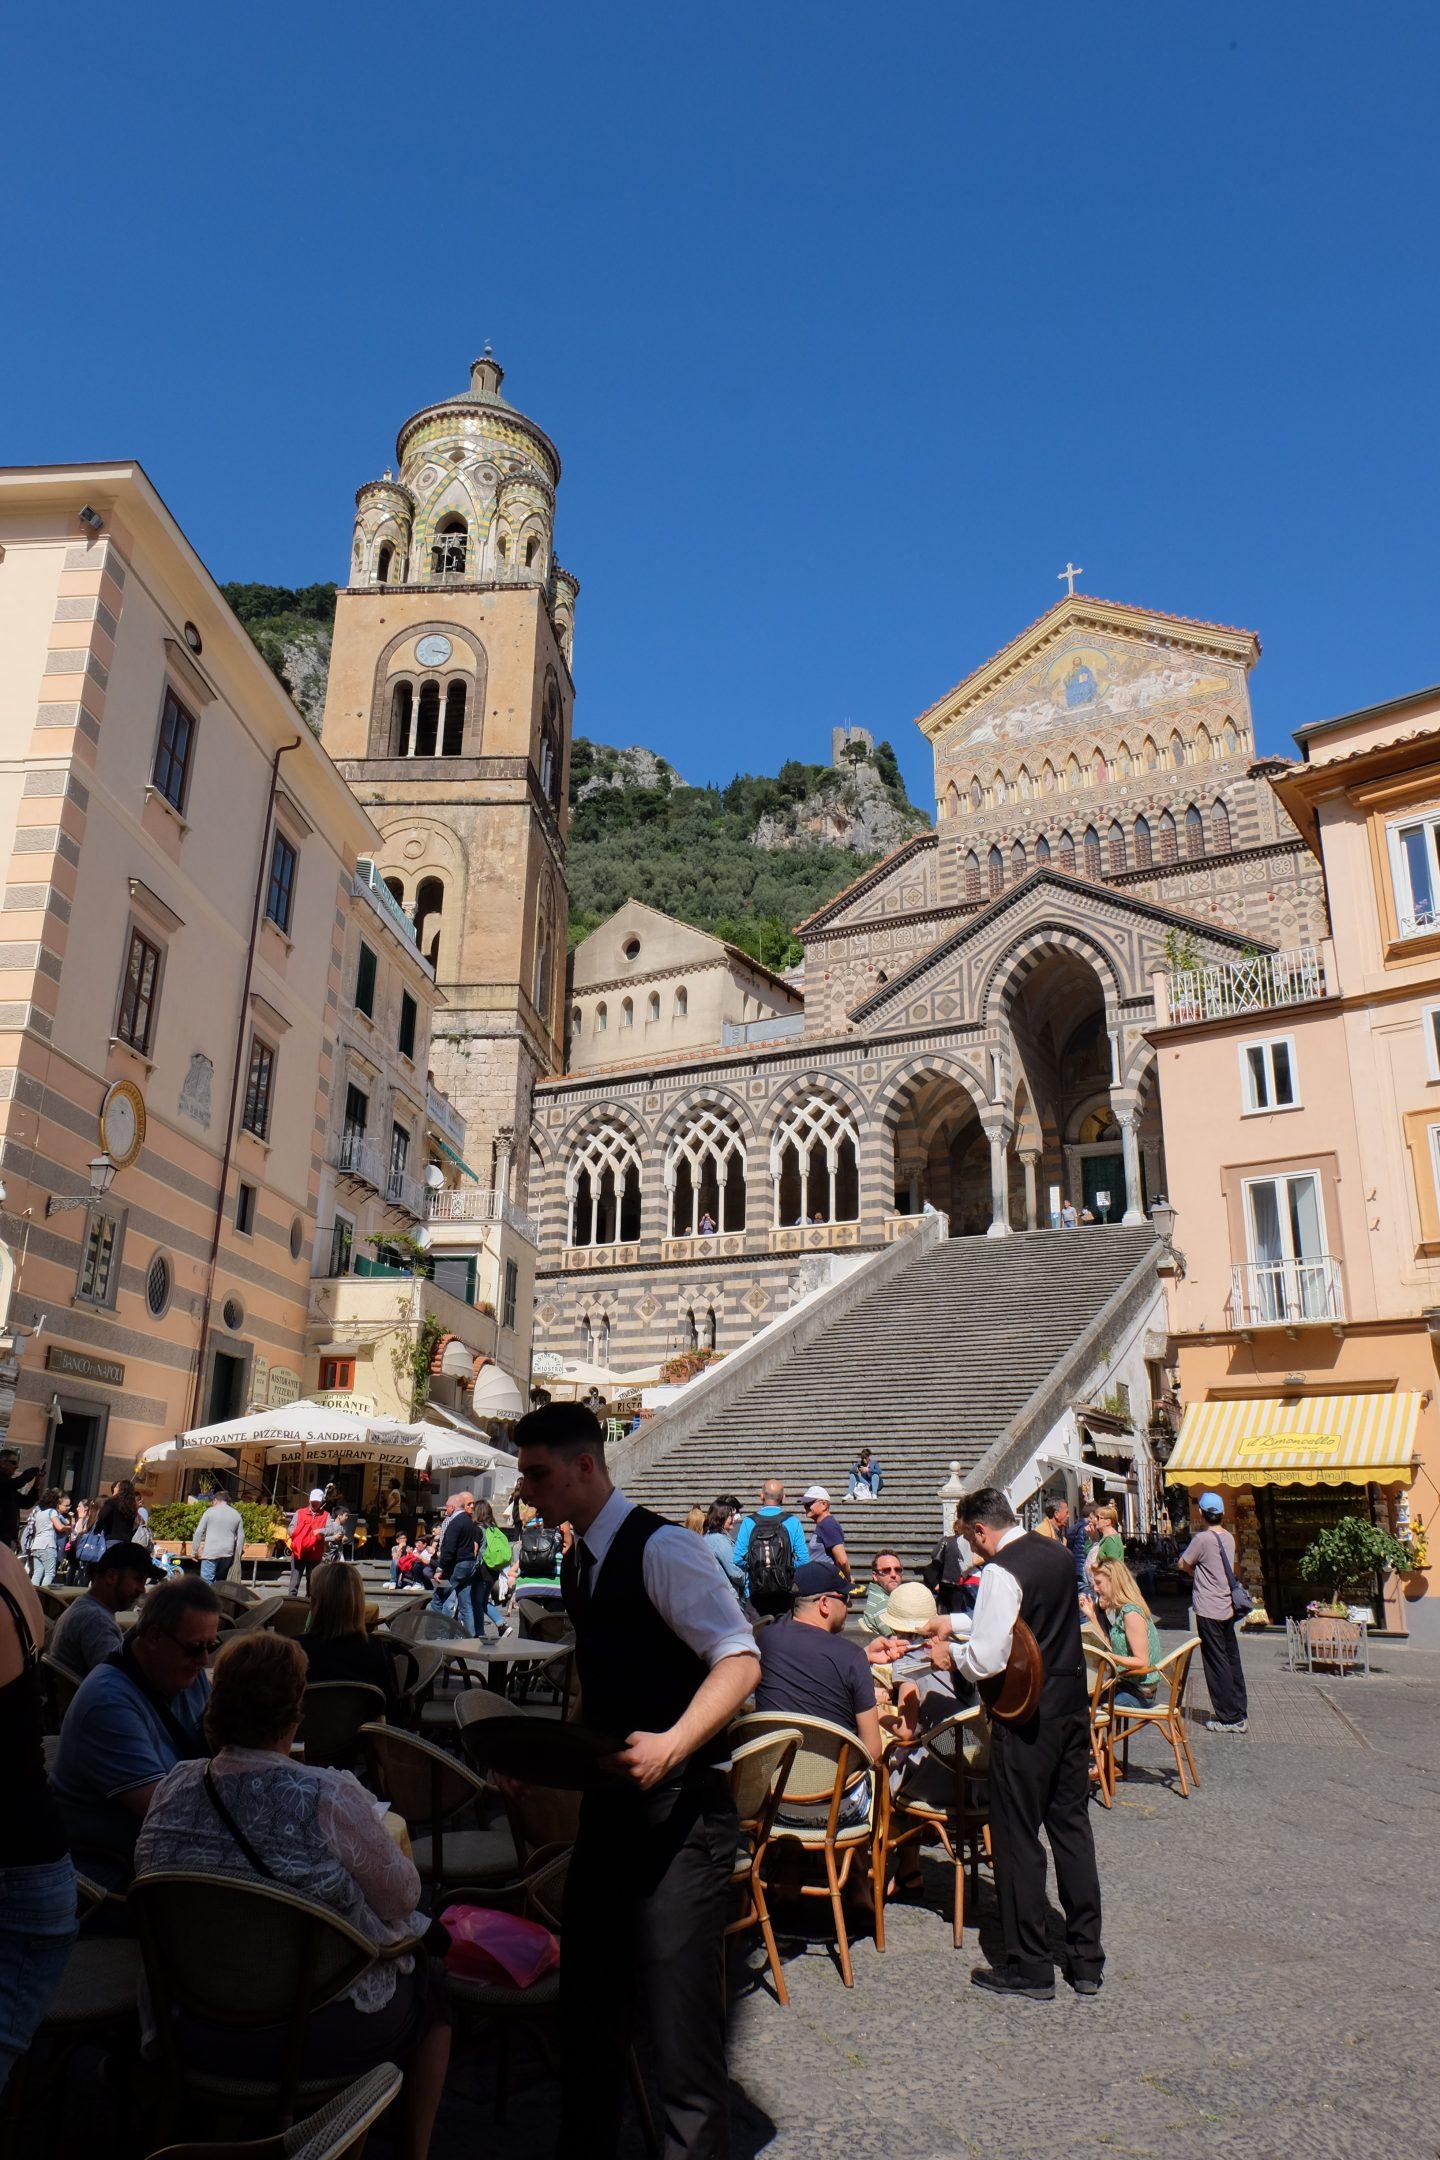 Piazza Duomo, Amalfi, Italy